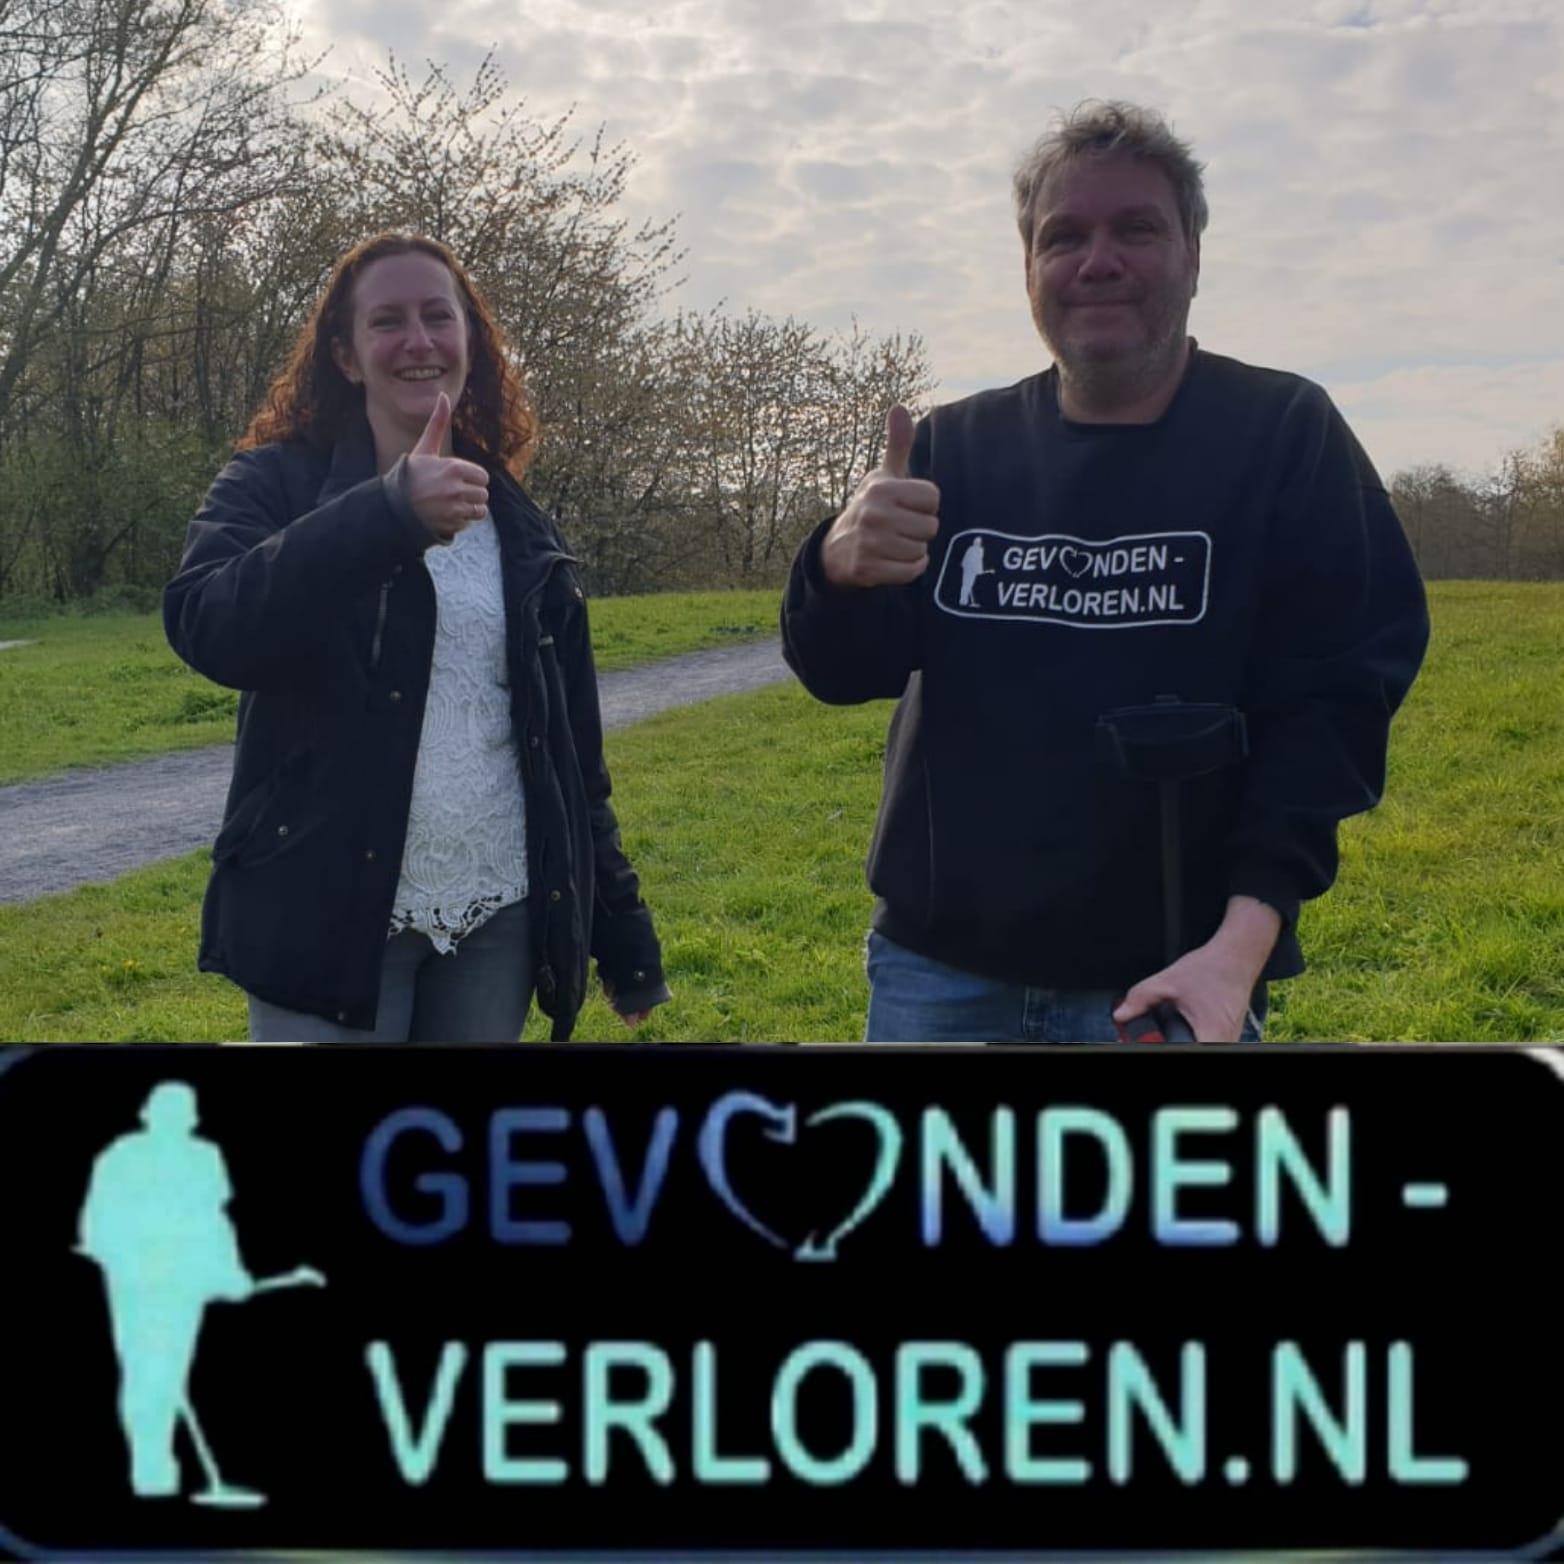 Ring verloren? Stichting gevonden-verloren.nl kan u helpen